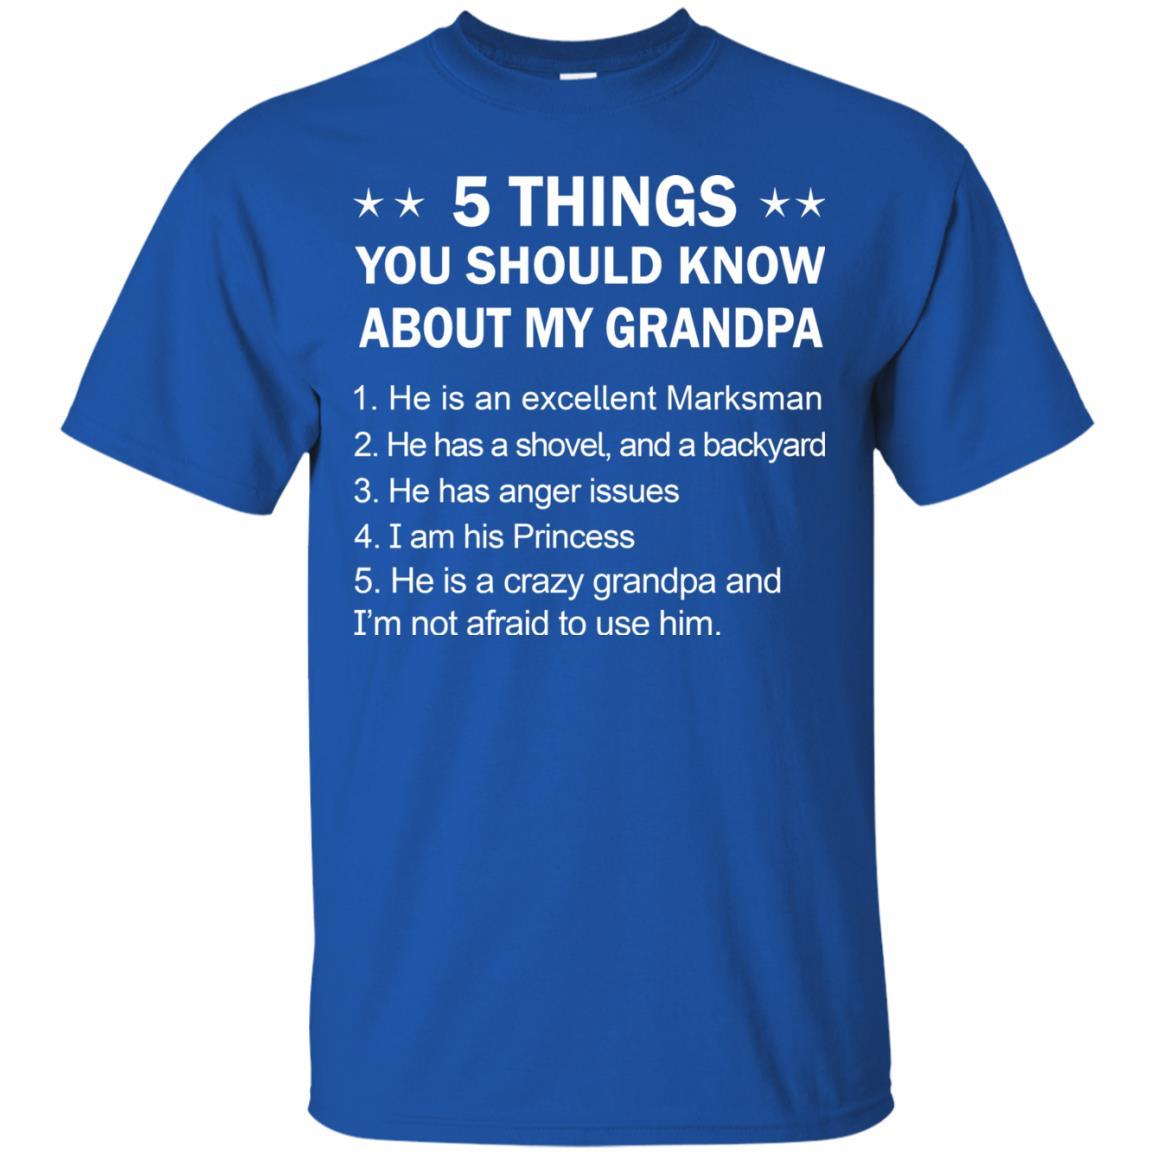 image 2325 - 5 Things You Should Know My Grandpa Shirt, Youth Shirt